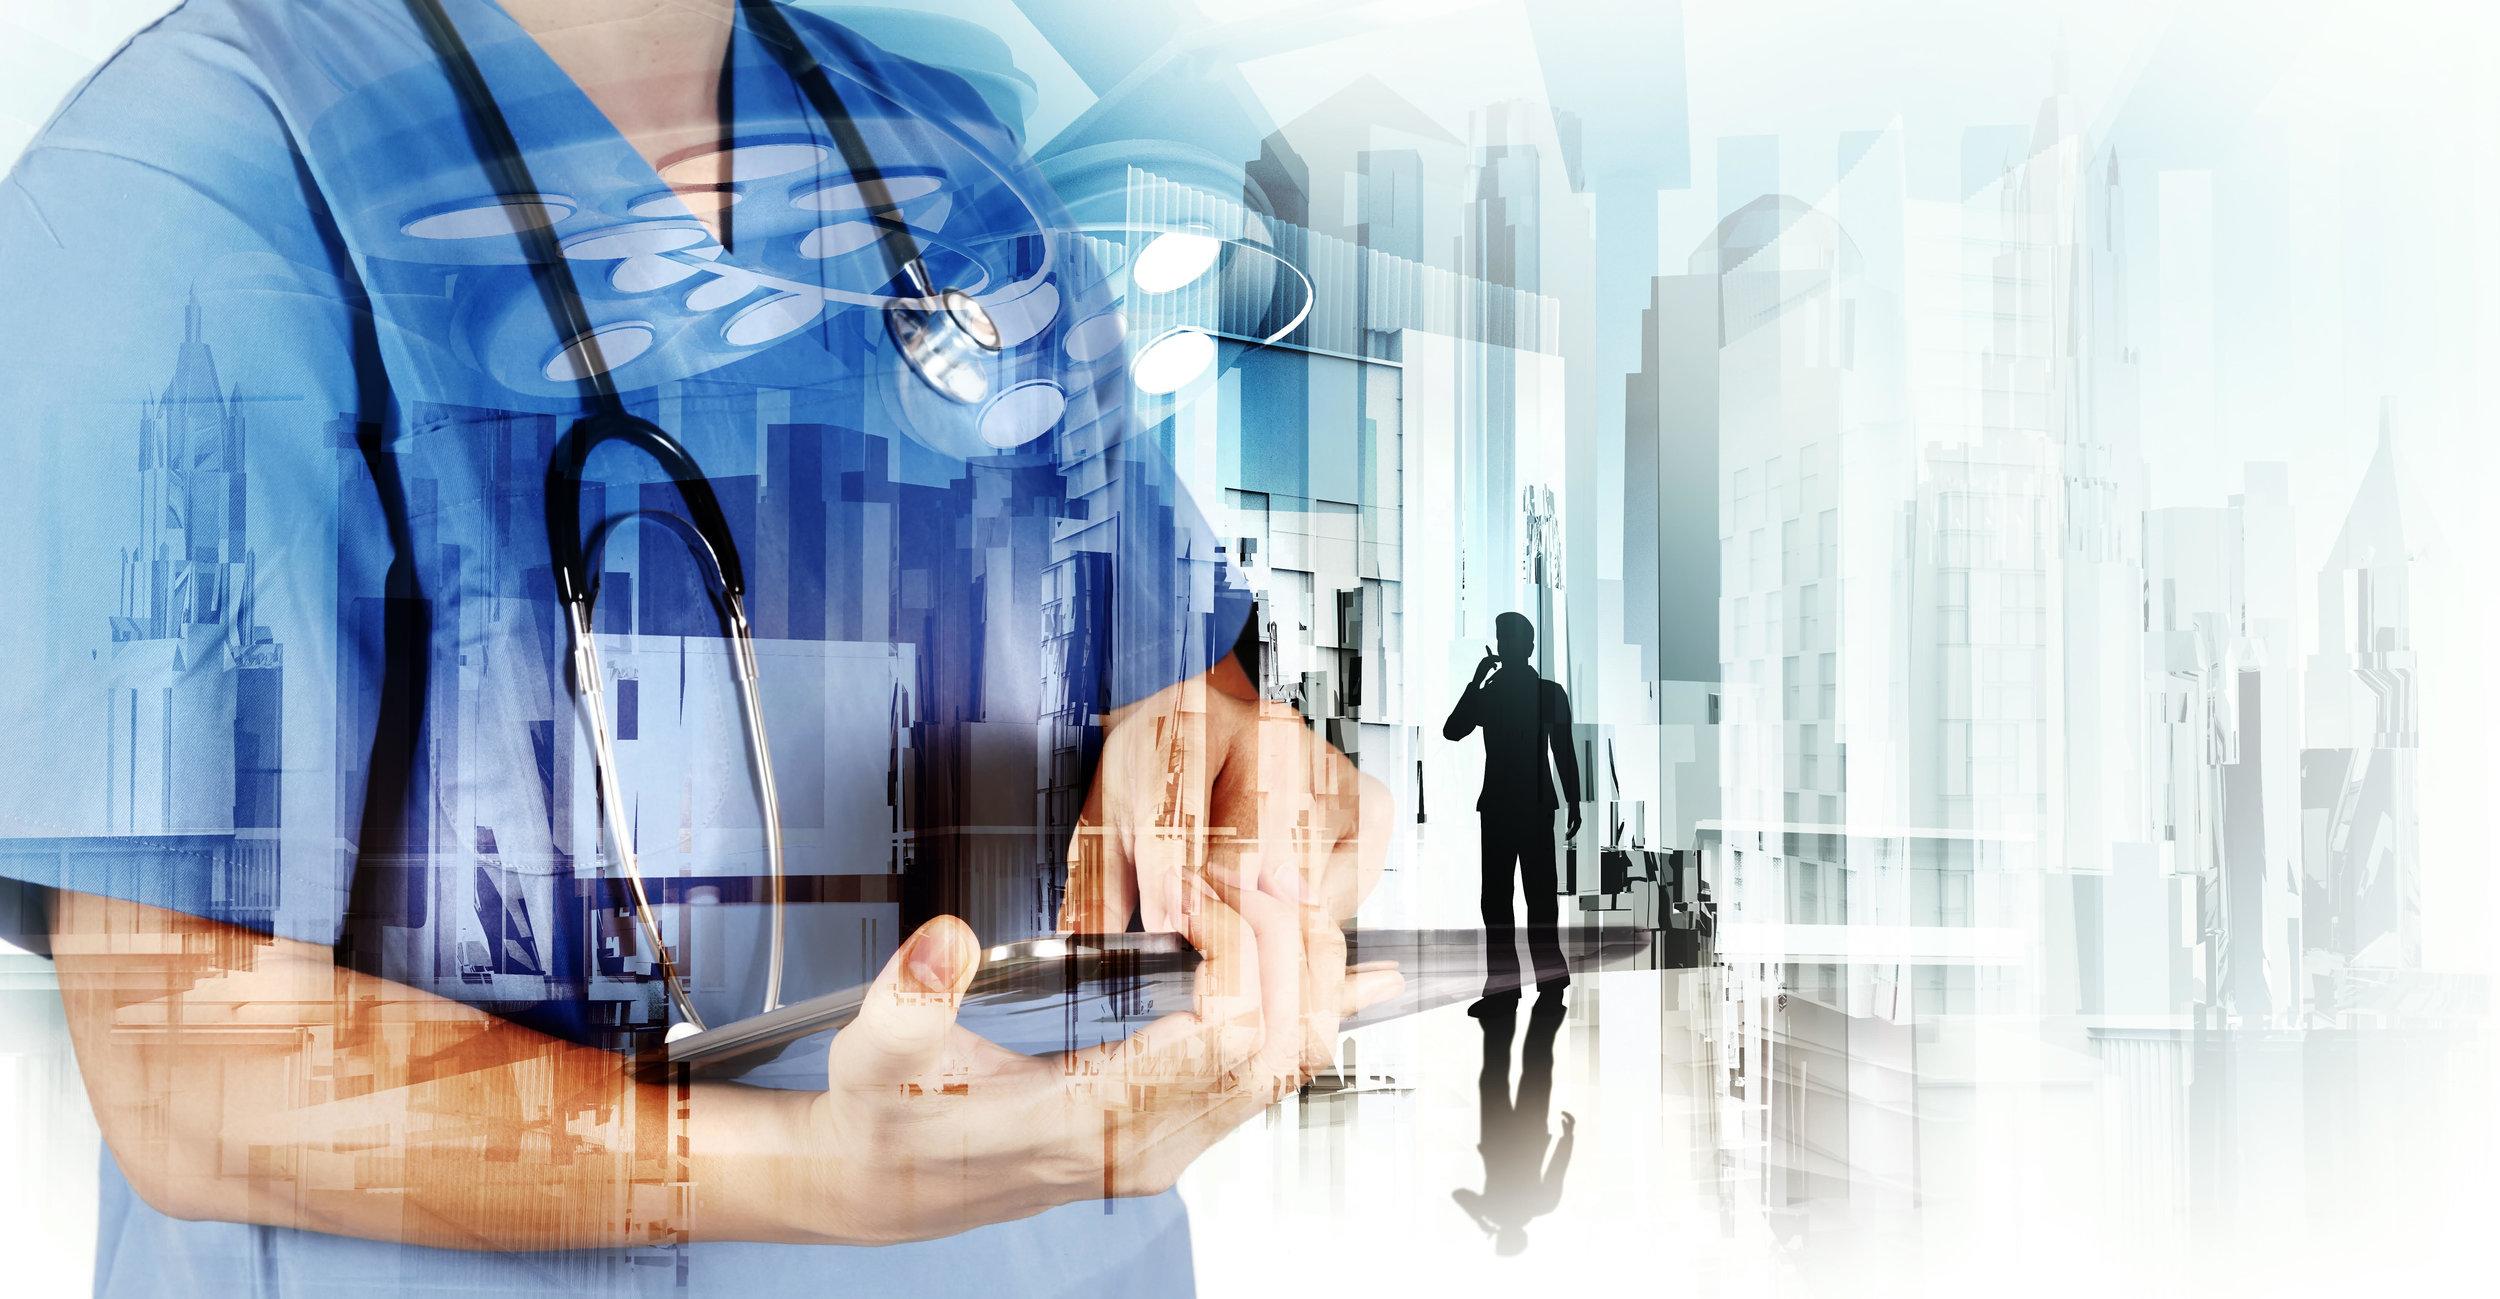 rpm-billing-llc-healthcare-billing-audits-finding-lost-revenue.jpg